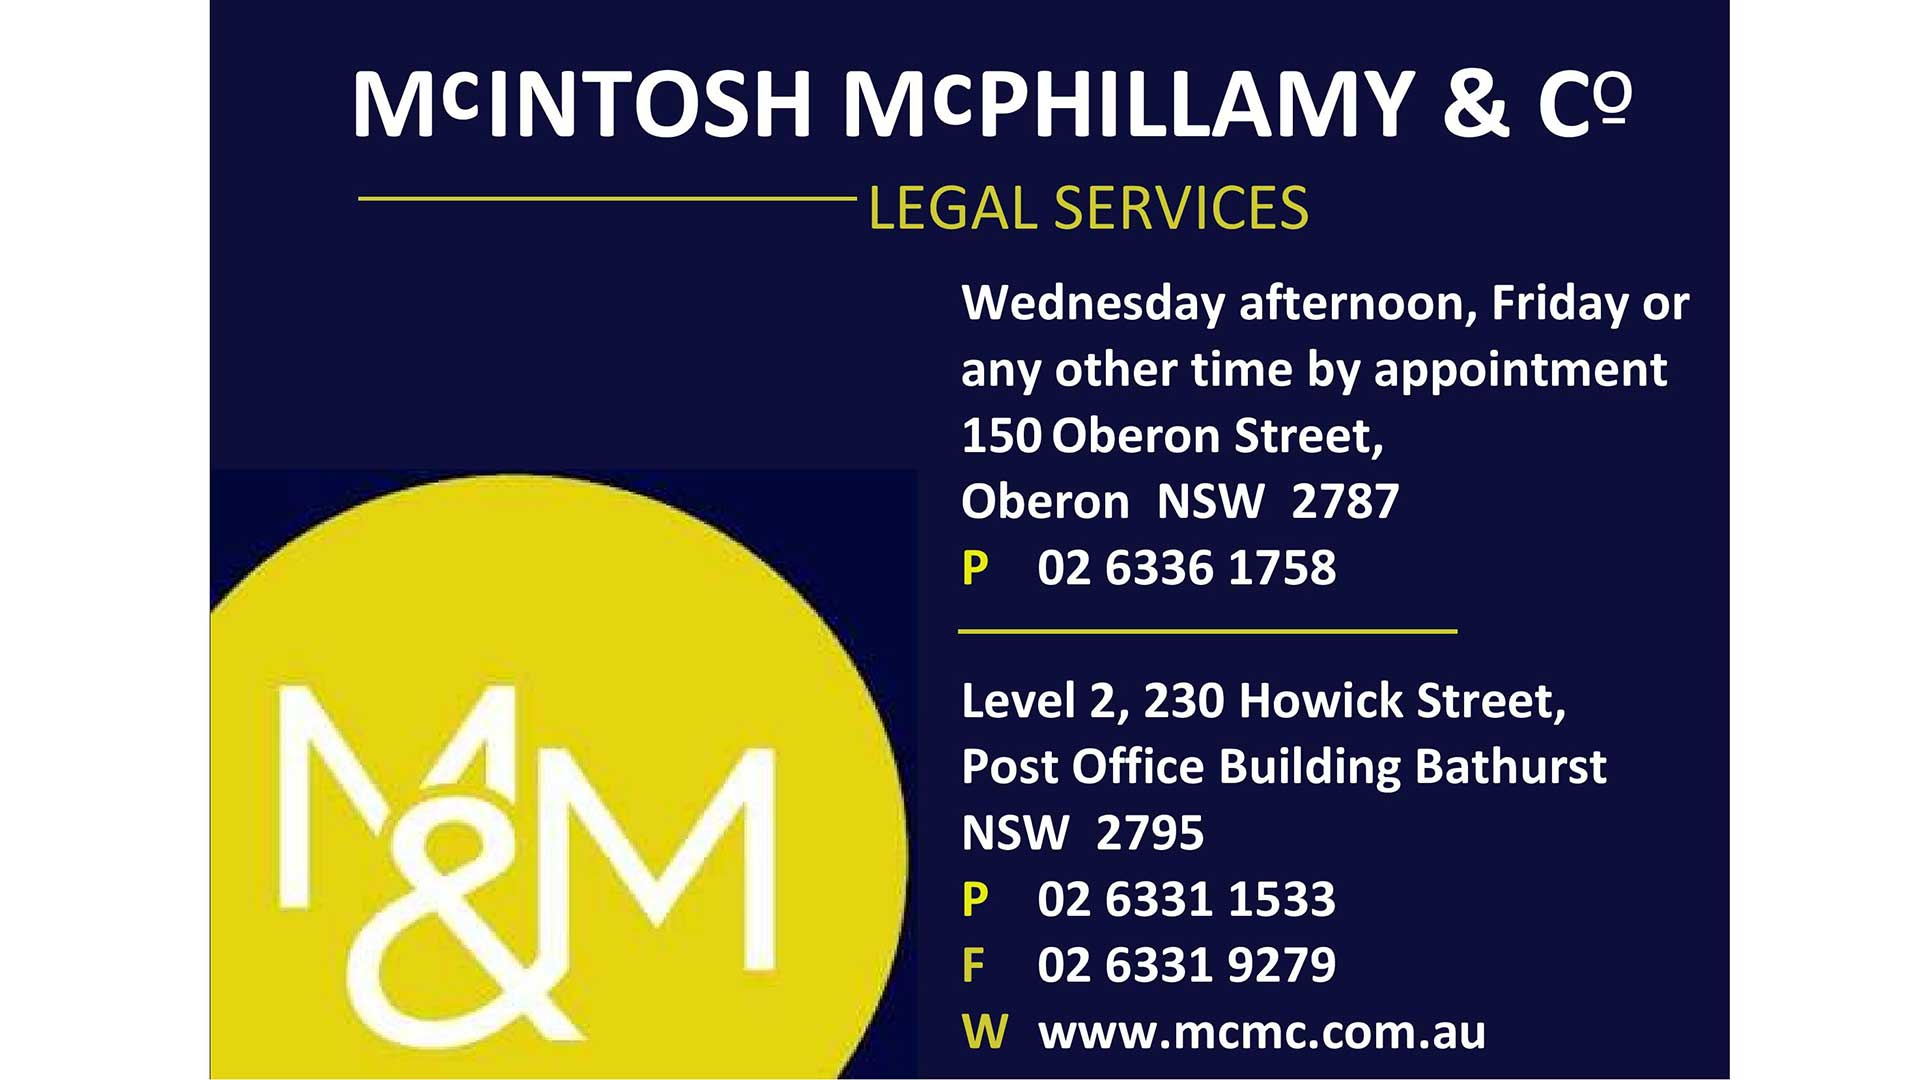 Business - Mcintosh Mcphillamy & Co Legal Services | Visit Oberon